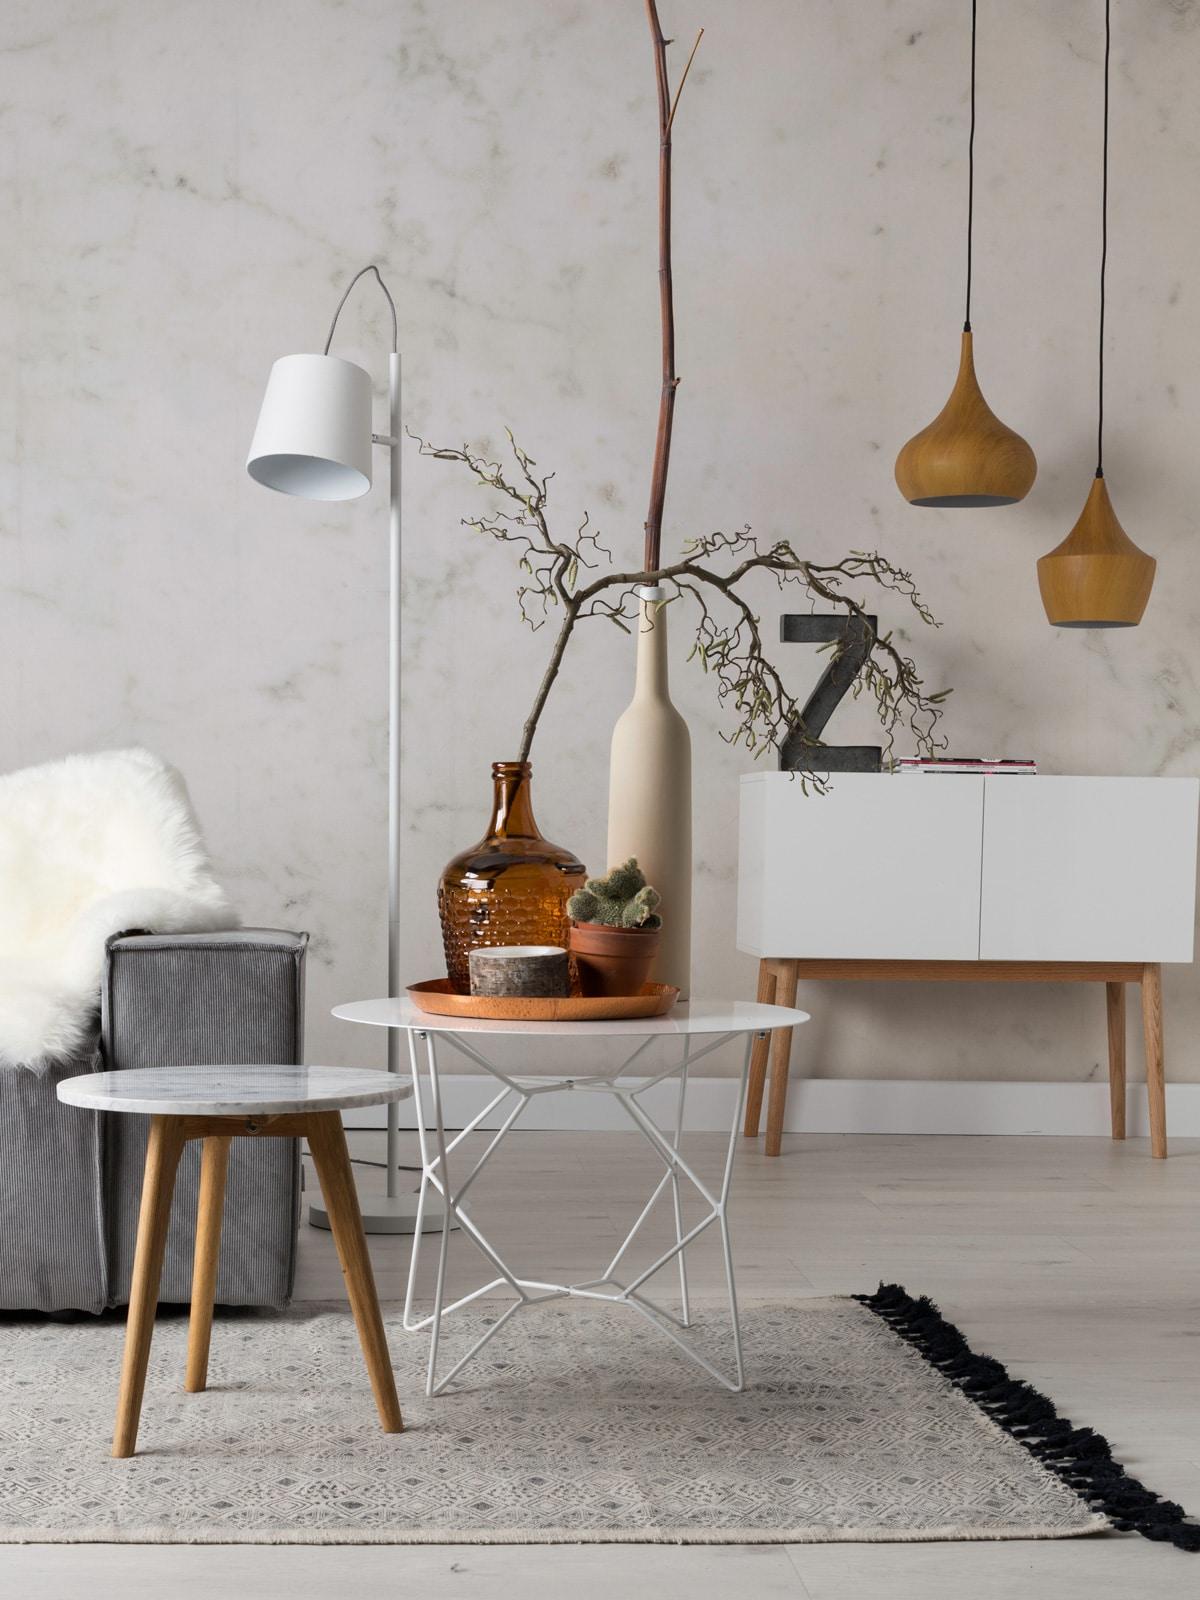 designerleuchten als geschenk lampen leuchten. Black Bedroom Furniture Sets. Home Design Ideas